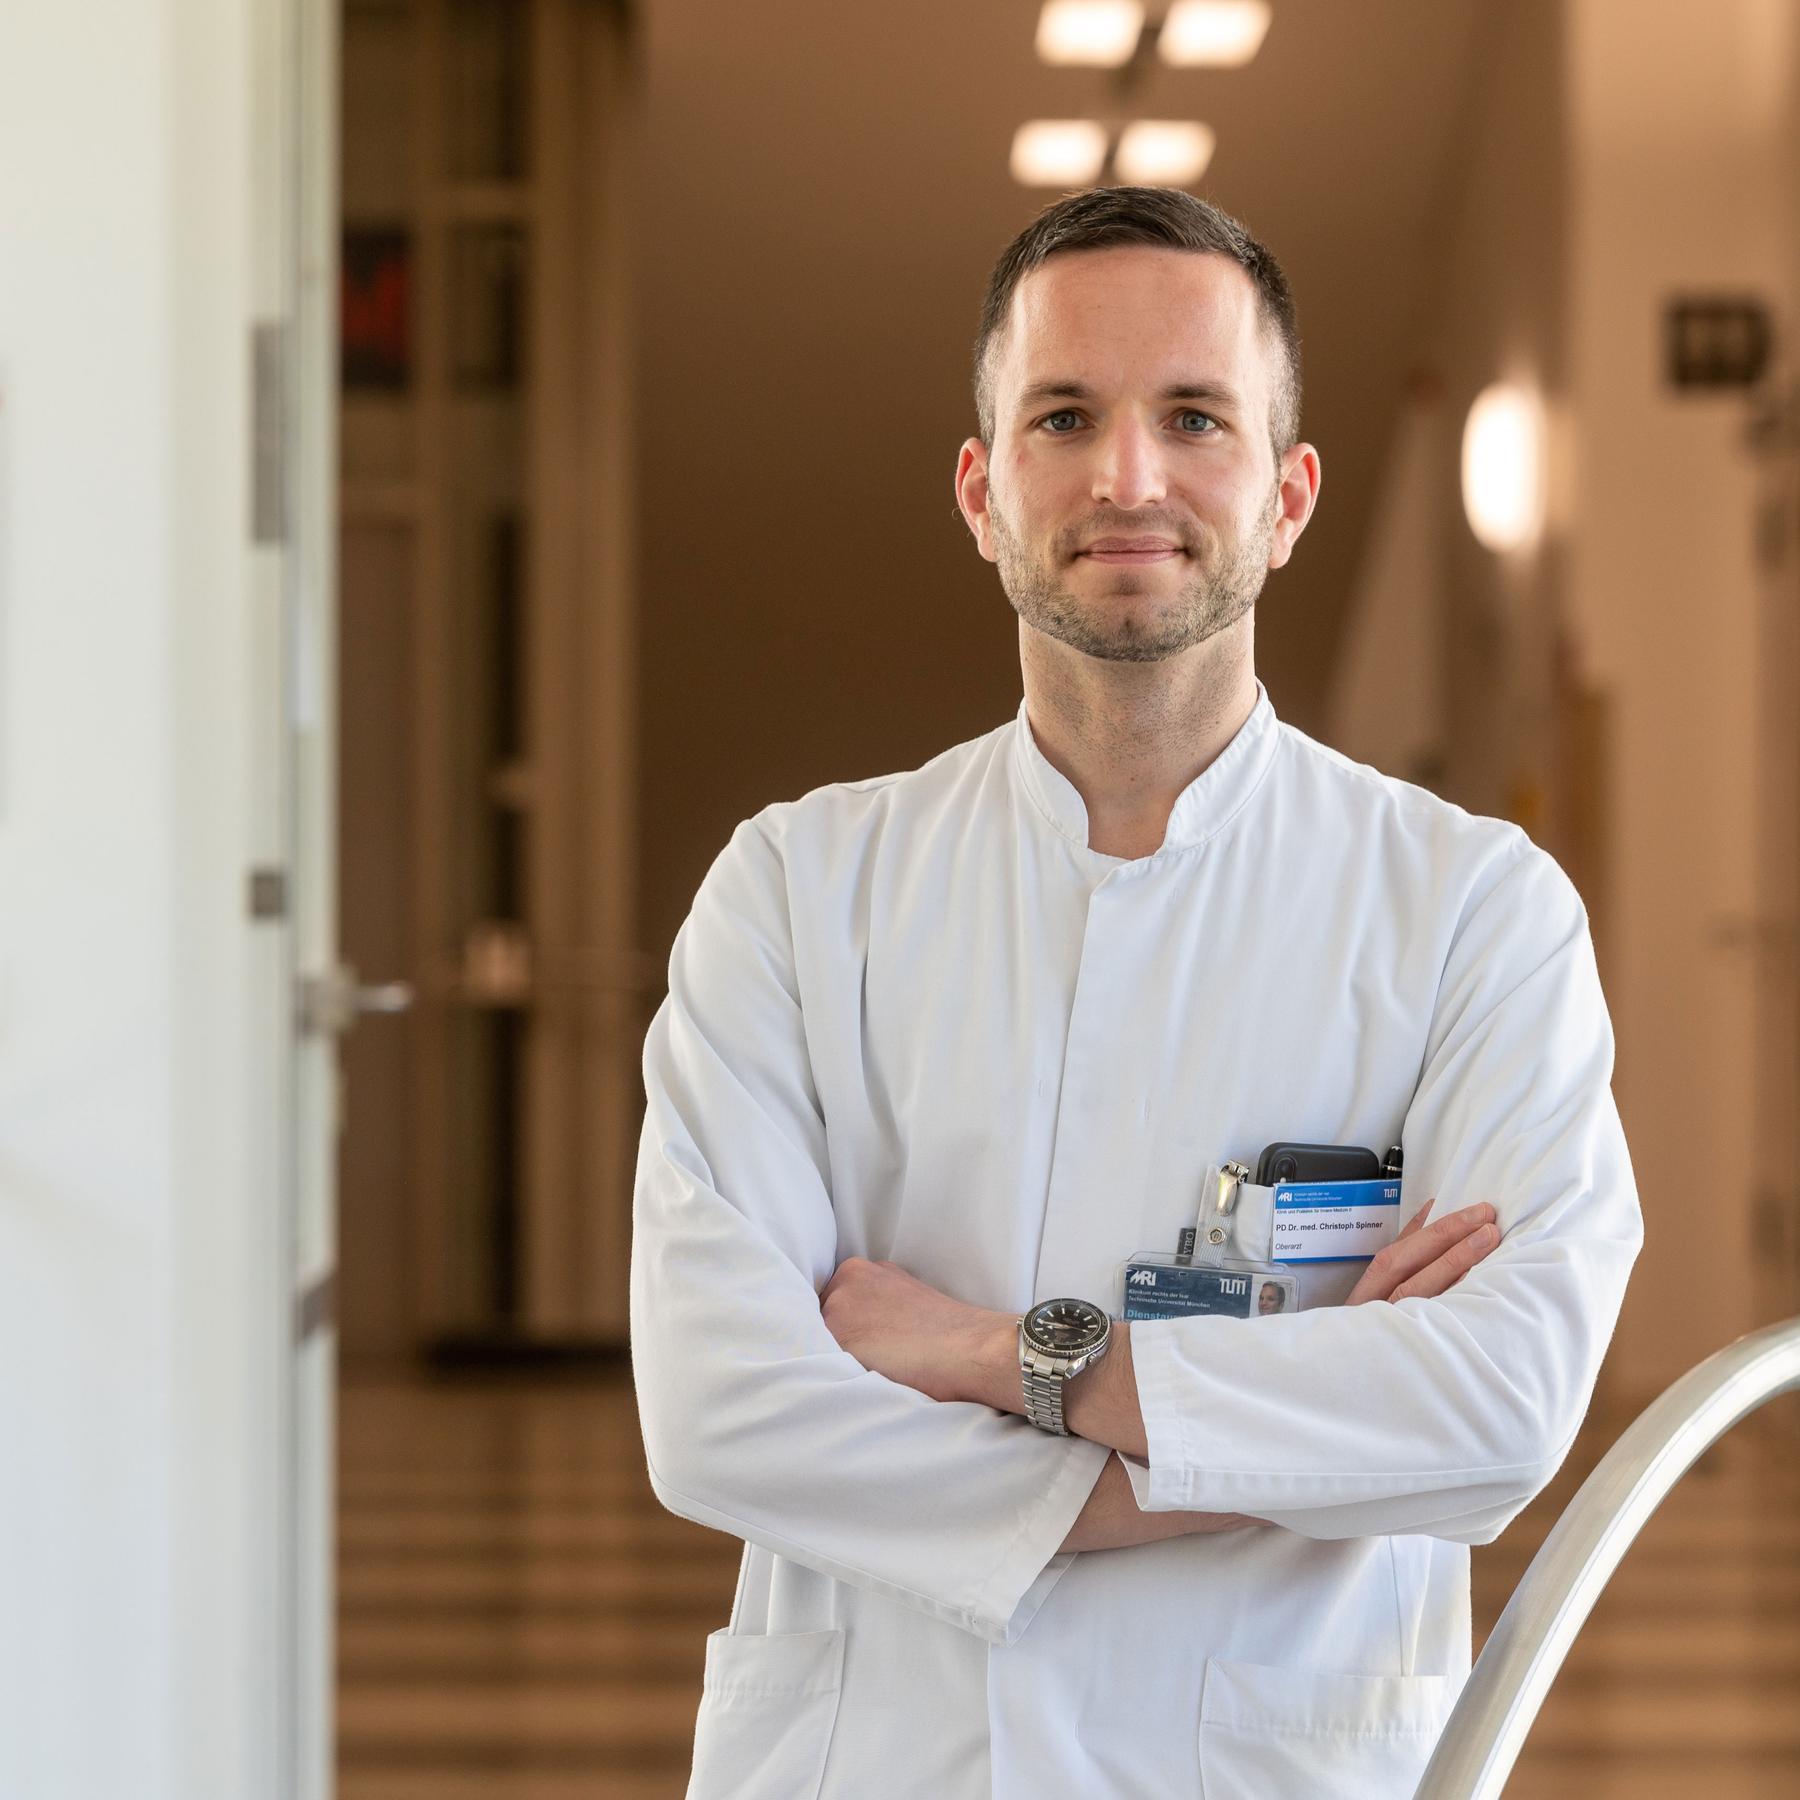 Corona-News mit Dr. Christoph Spinner (21.04.2021)